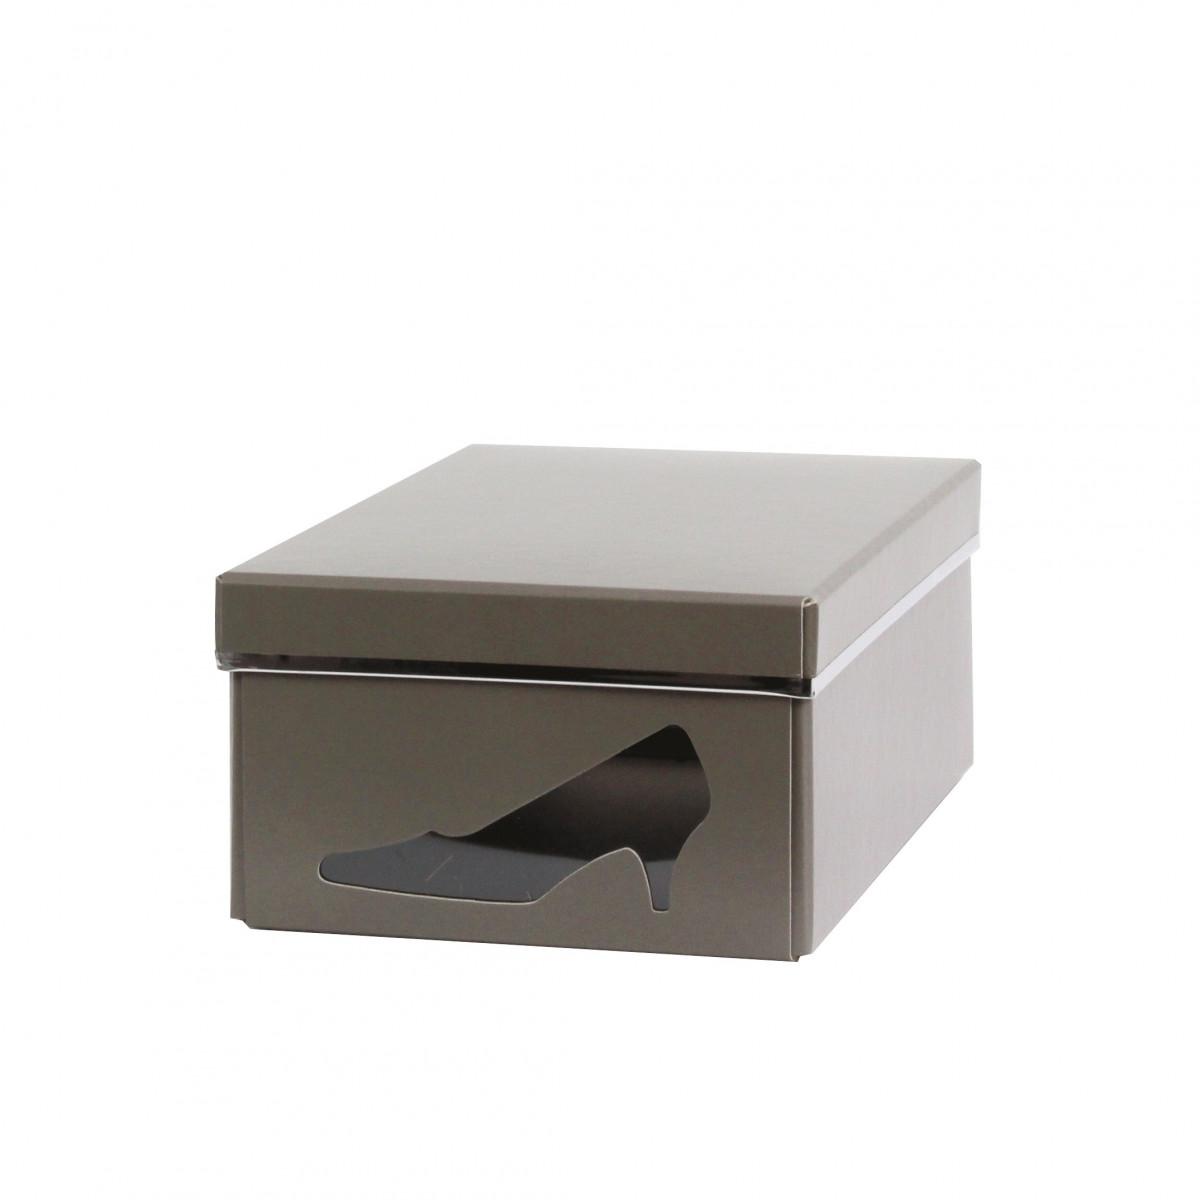 Bo te chaussures carton taupe rangement - Boite de rangement chaussure ...